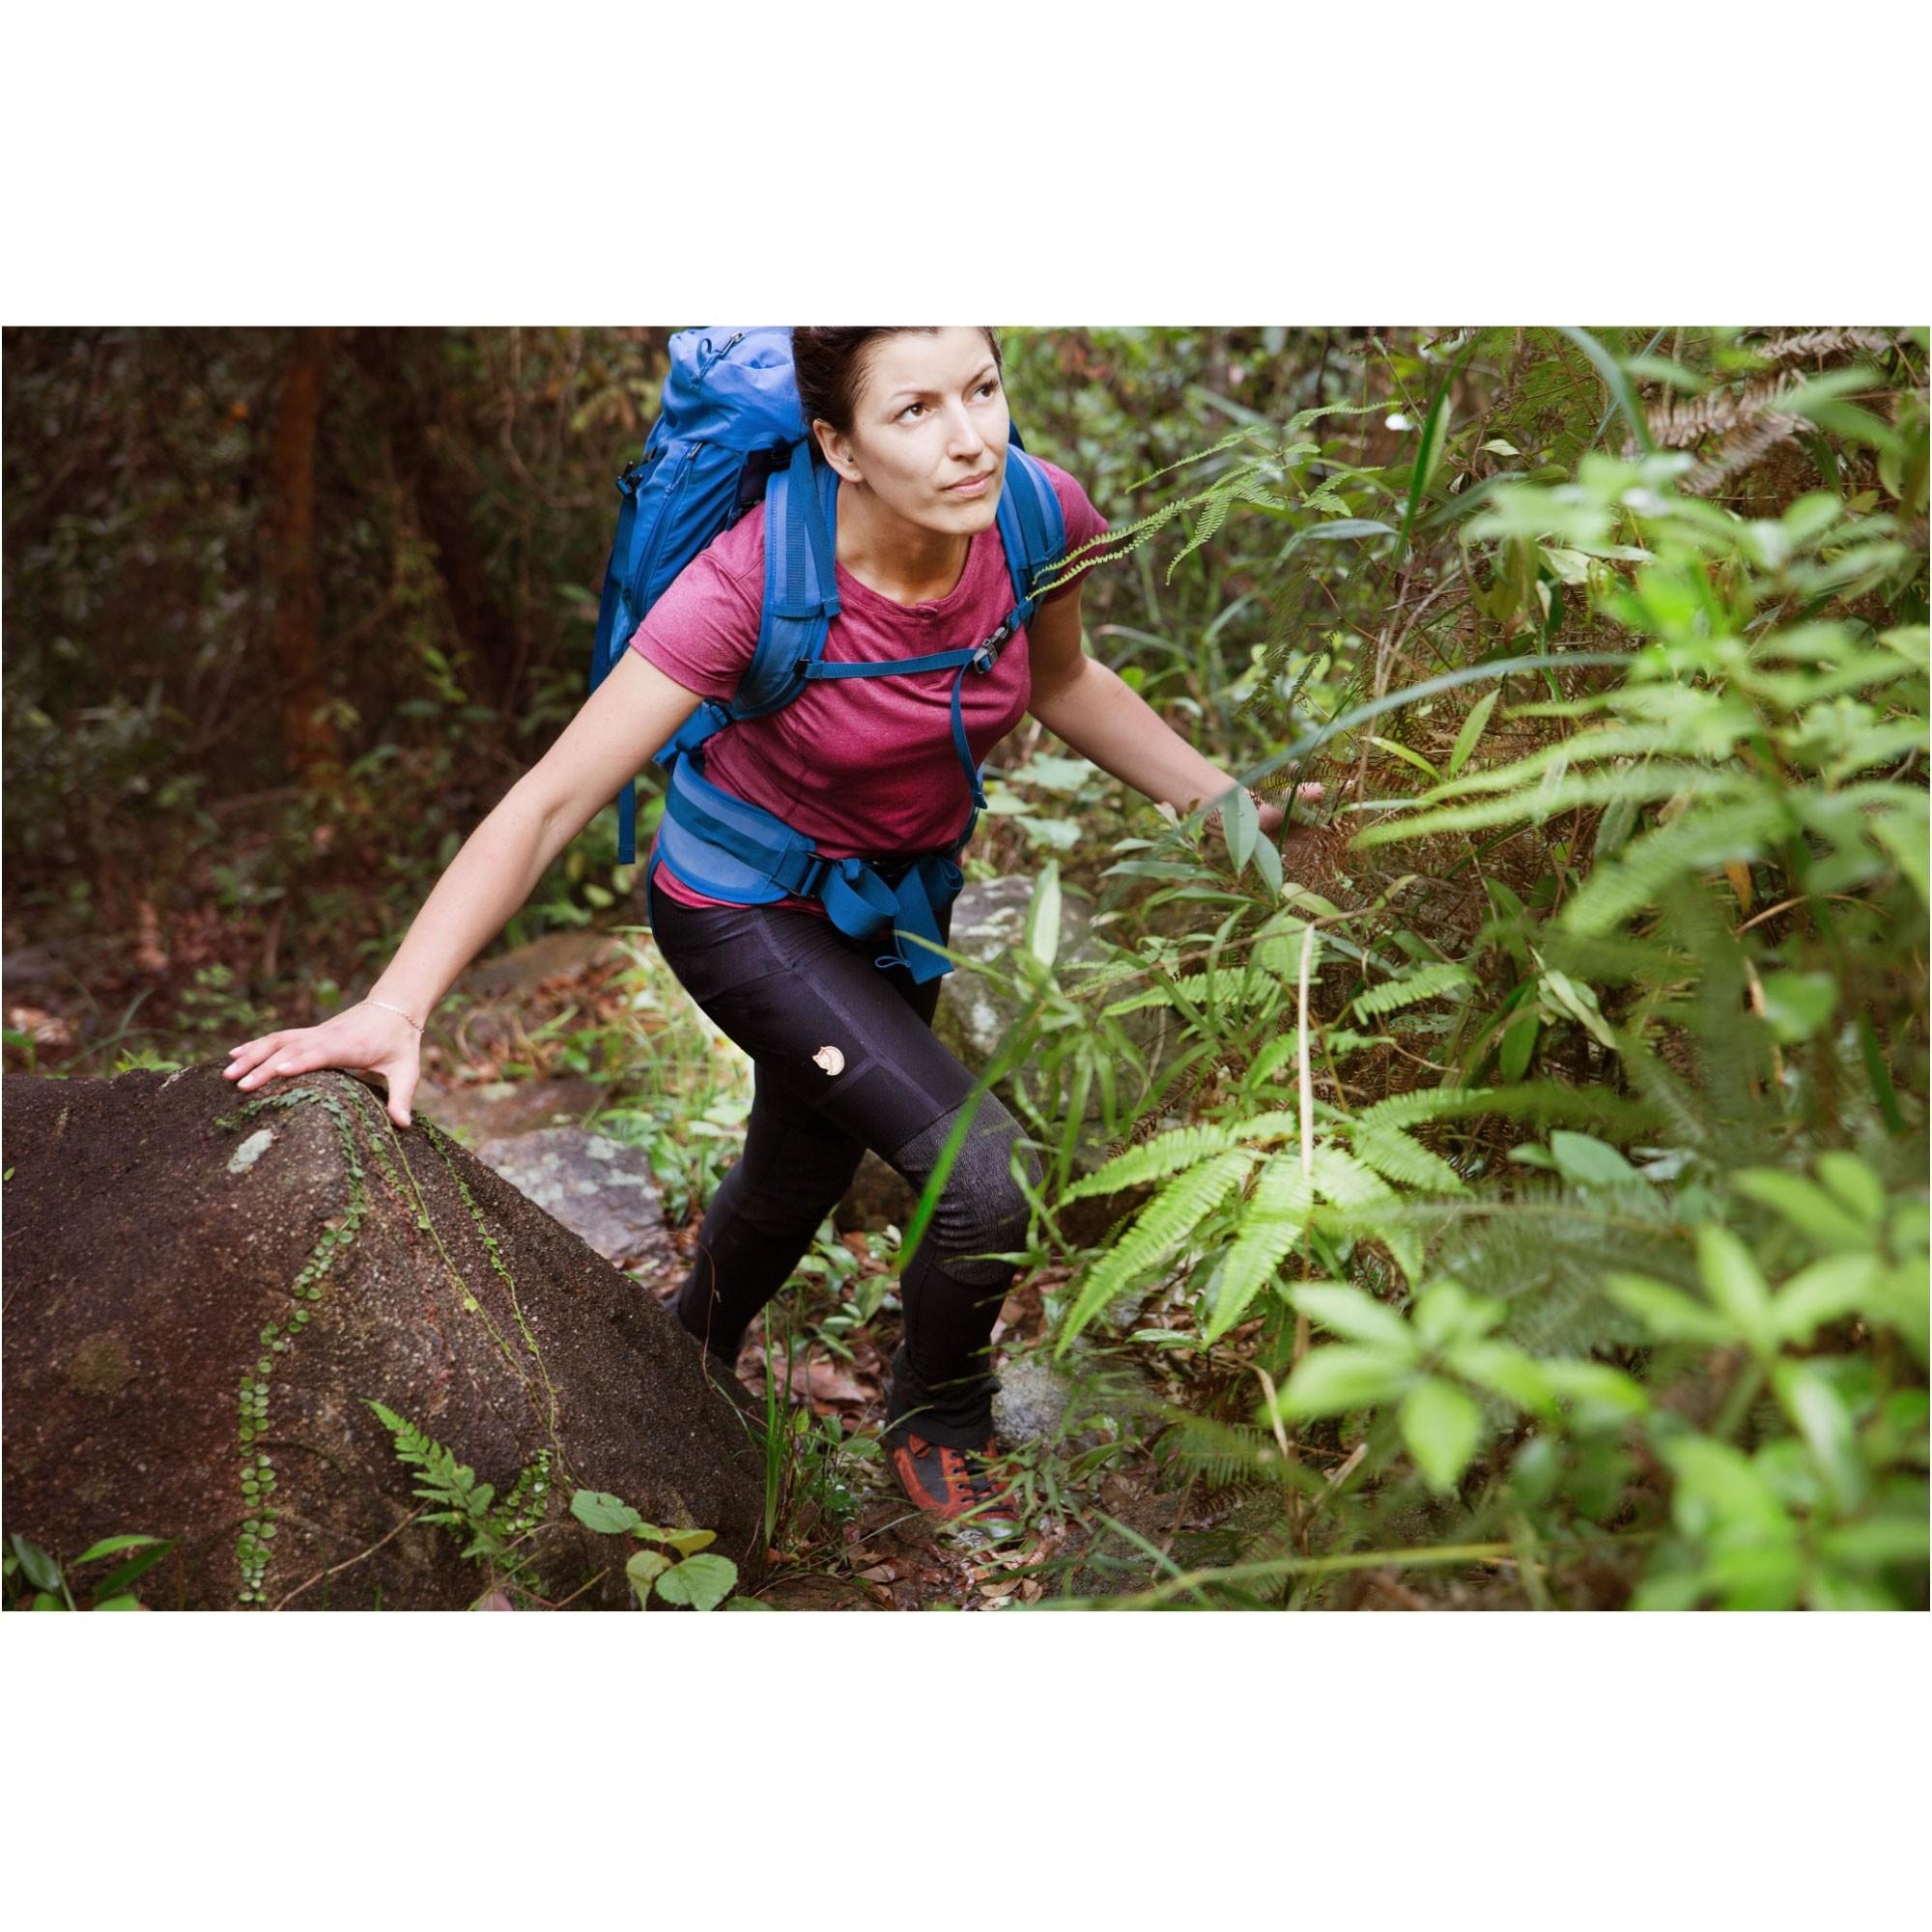 Fjallraven Abisko Women's Trekking Tights - Black